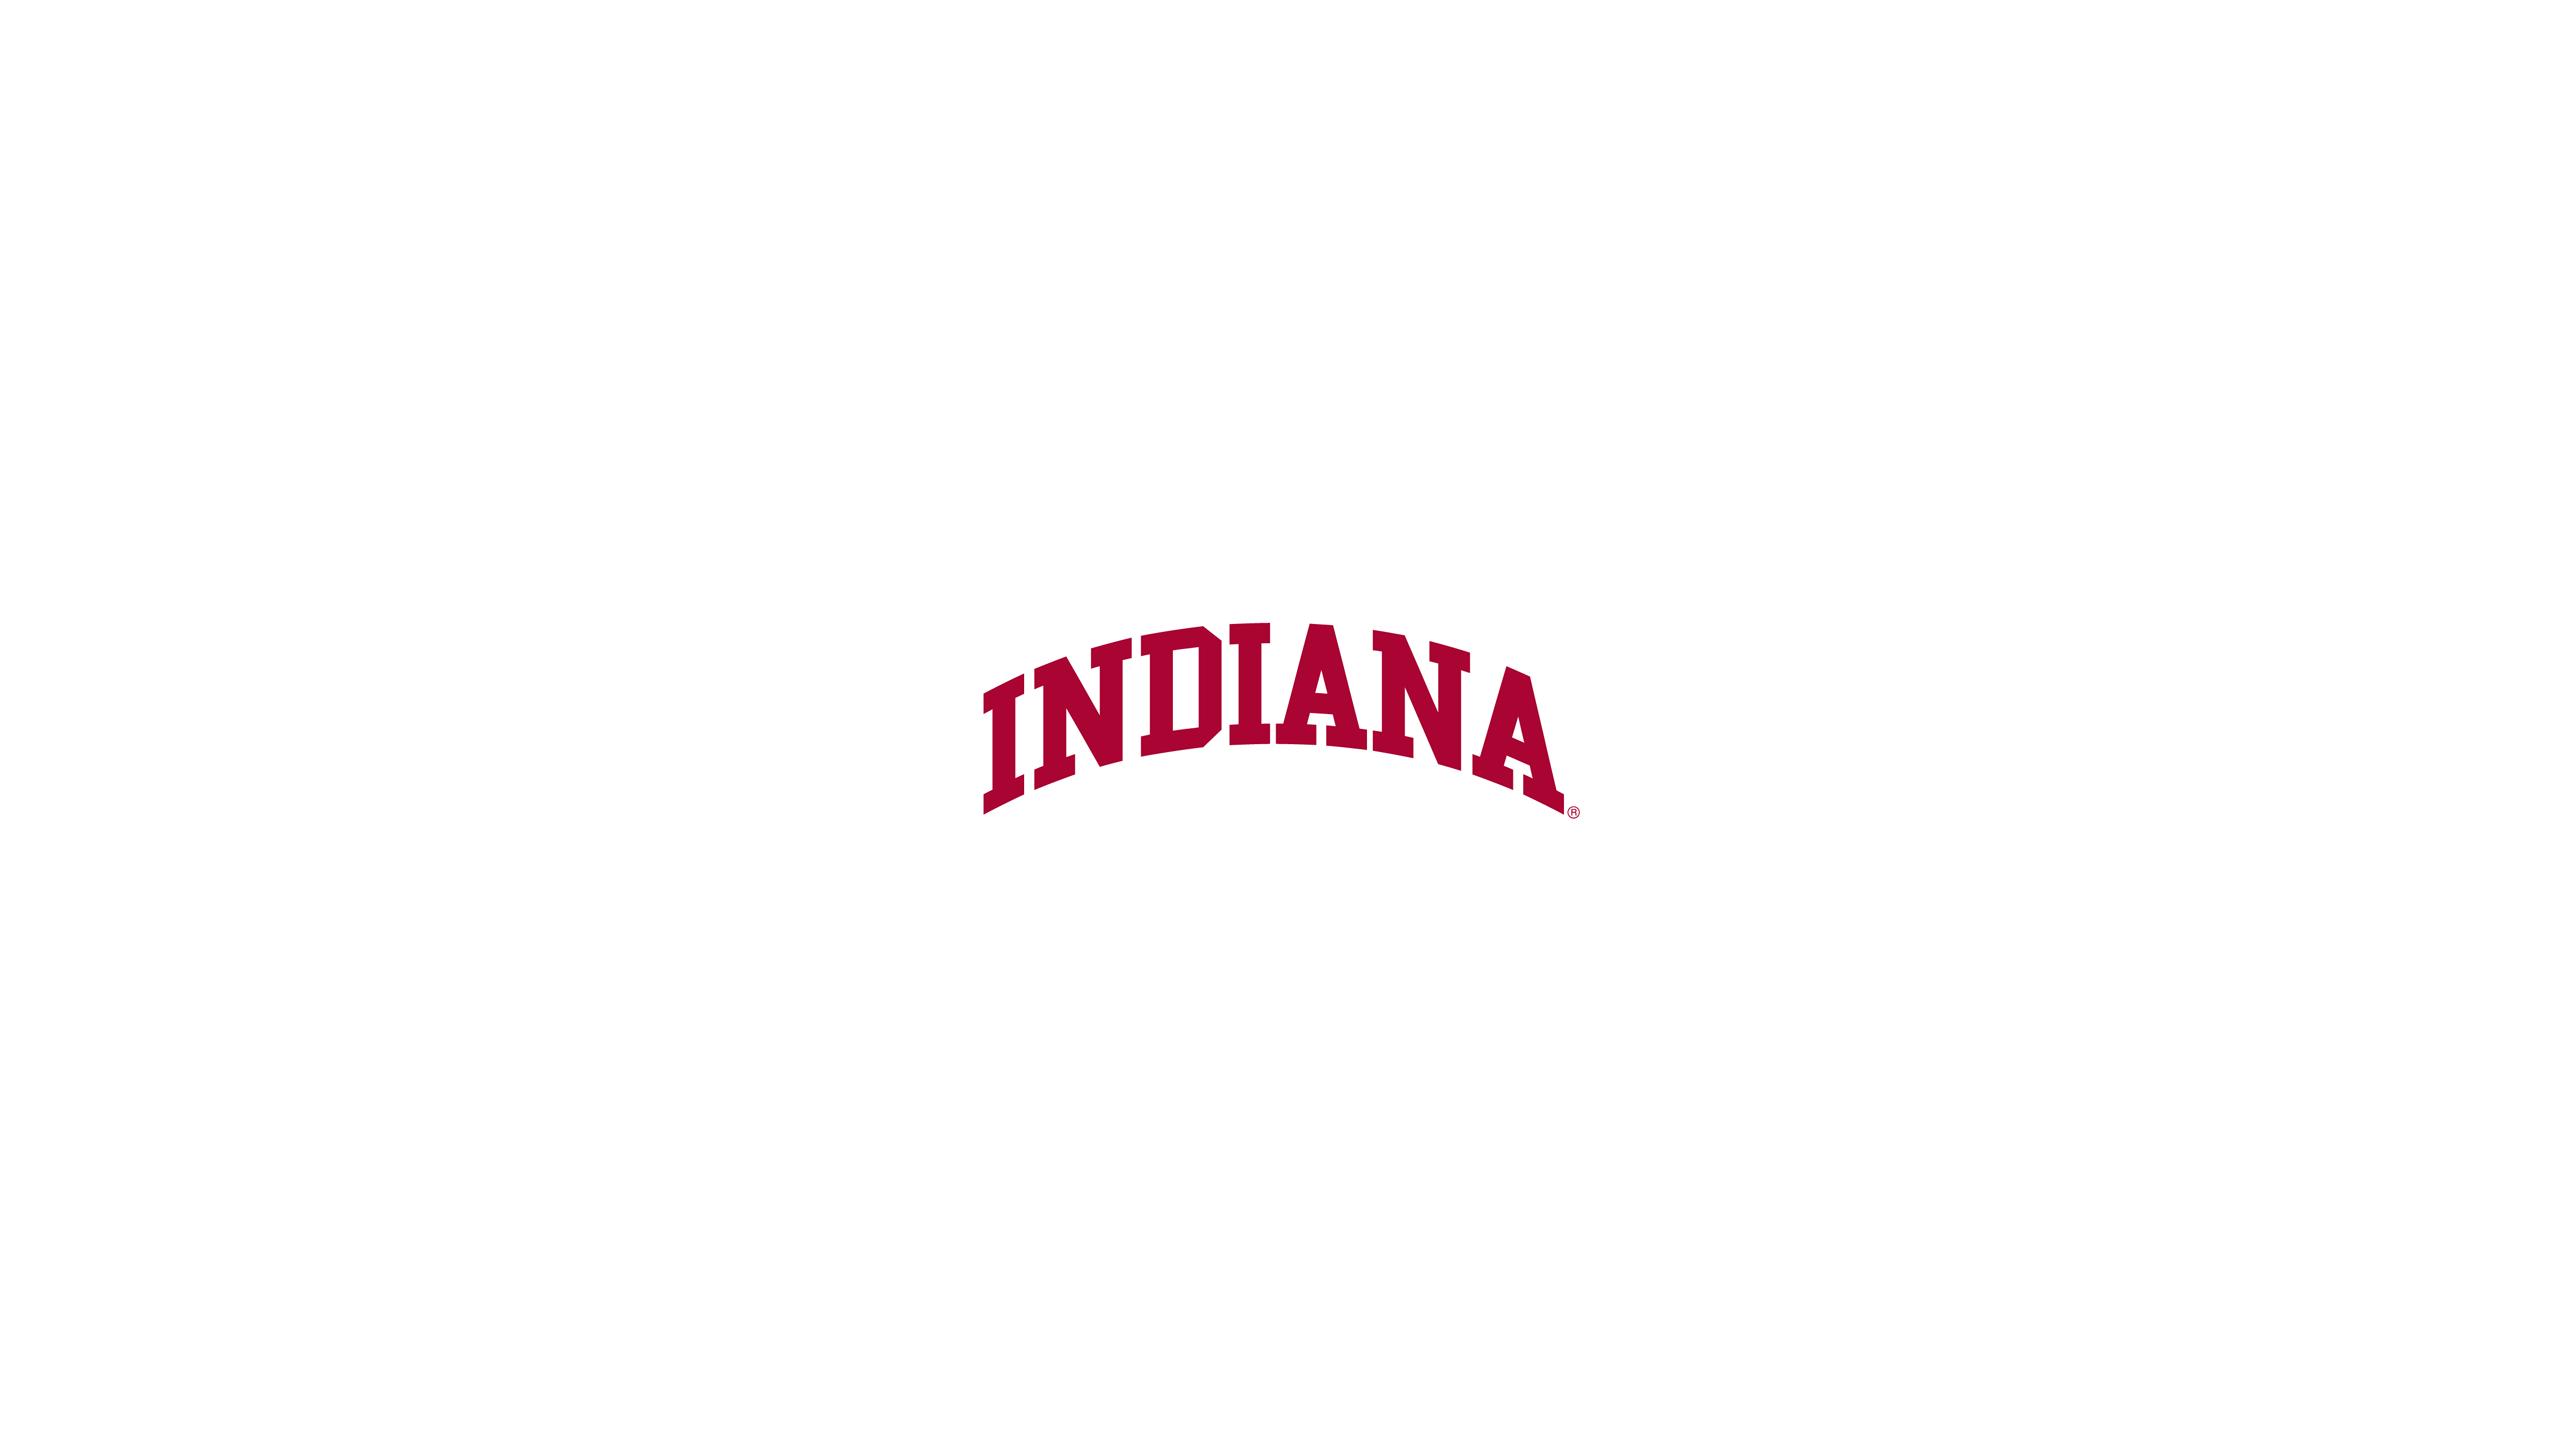 Indiana University Wallpapers 2560x1440